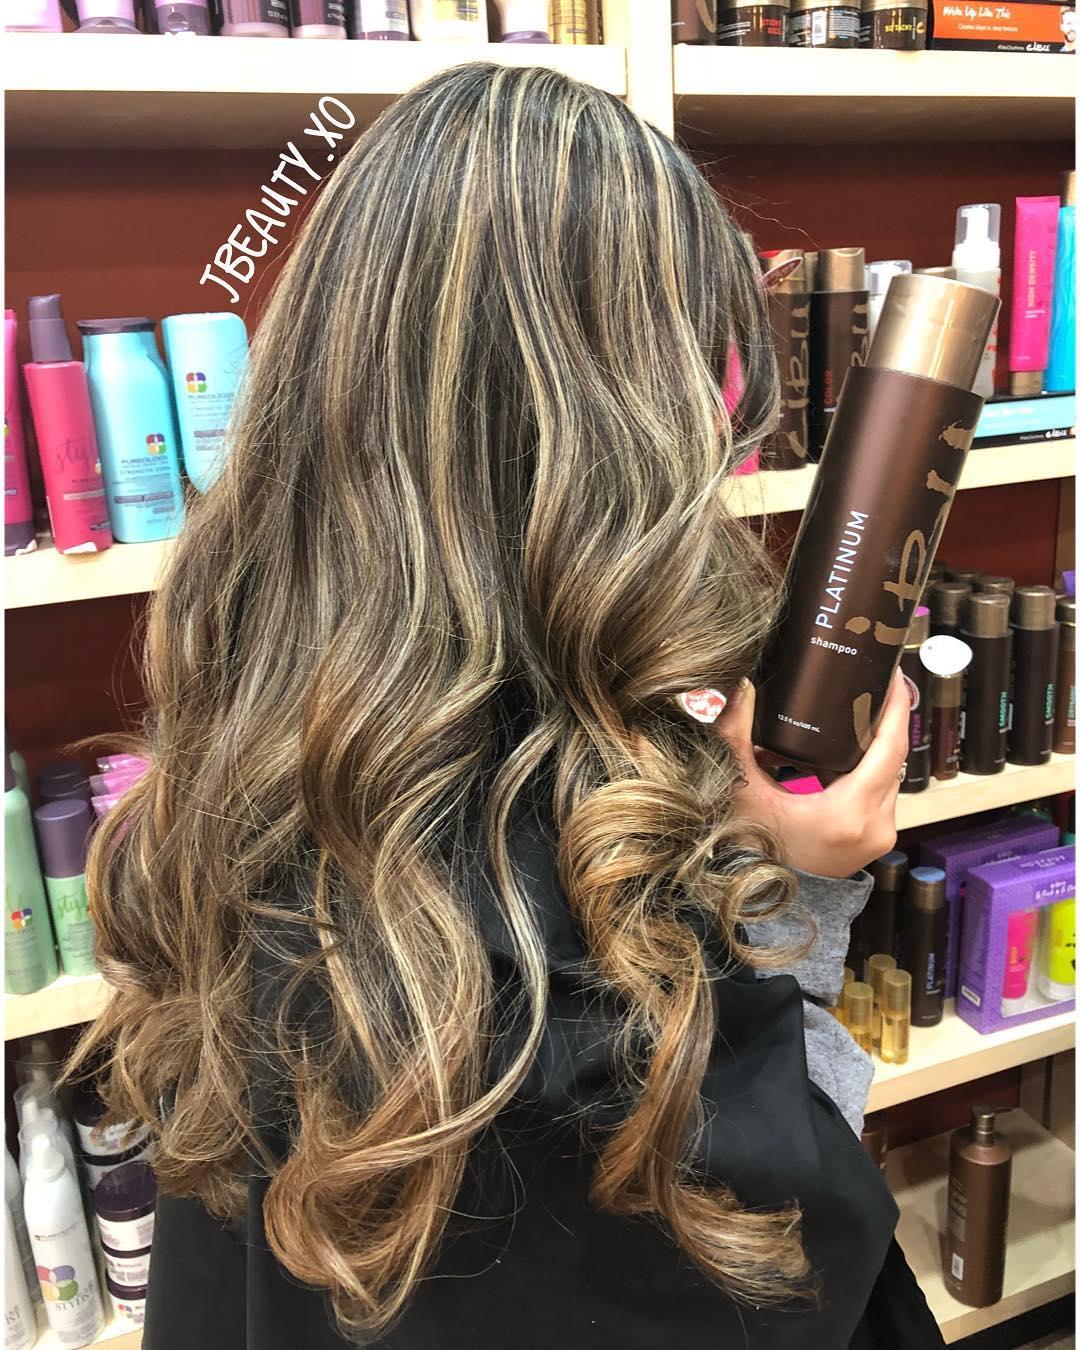 Purple Shampoo | Image of curly hair client holding Cibu Platinum Shampoo